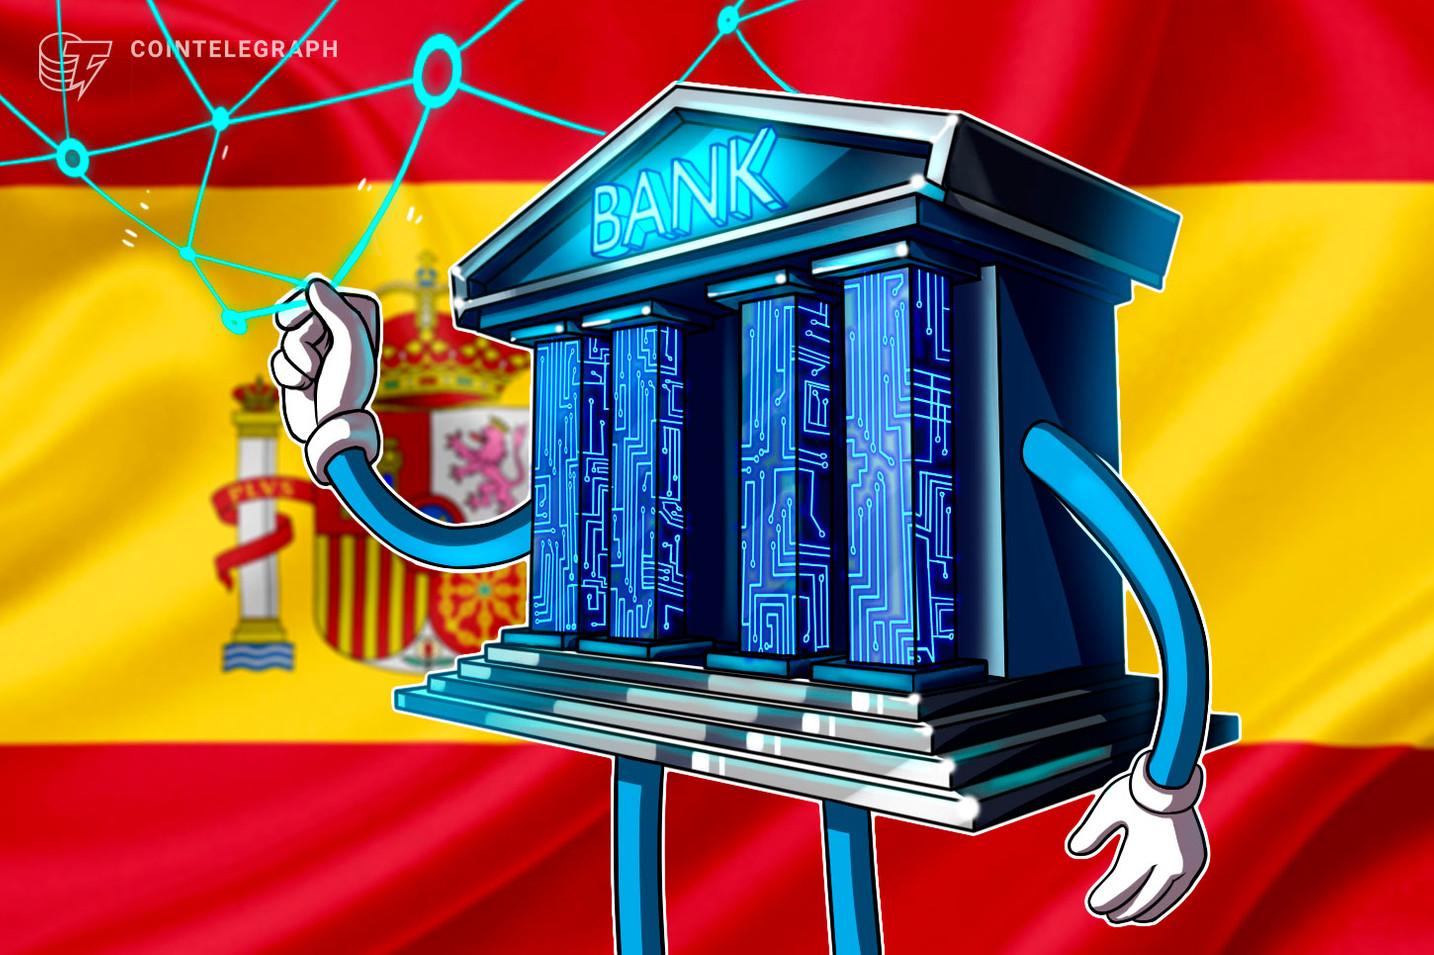 Spanish Multinational Bank BBVA to Explore Zero-Knowledge Proofs